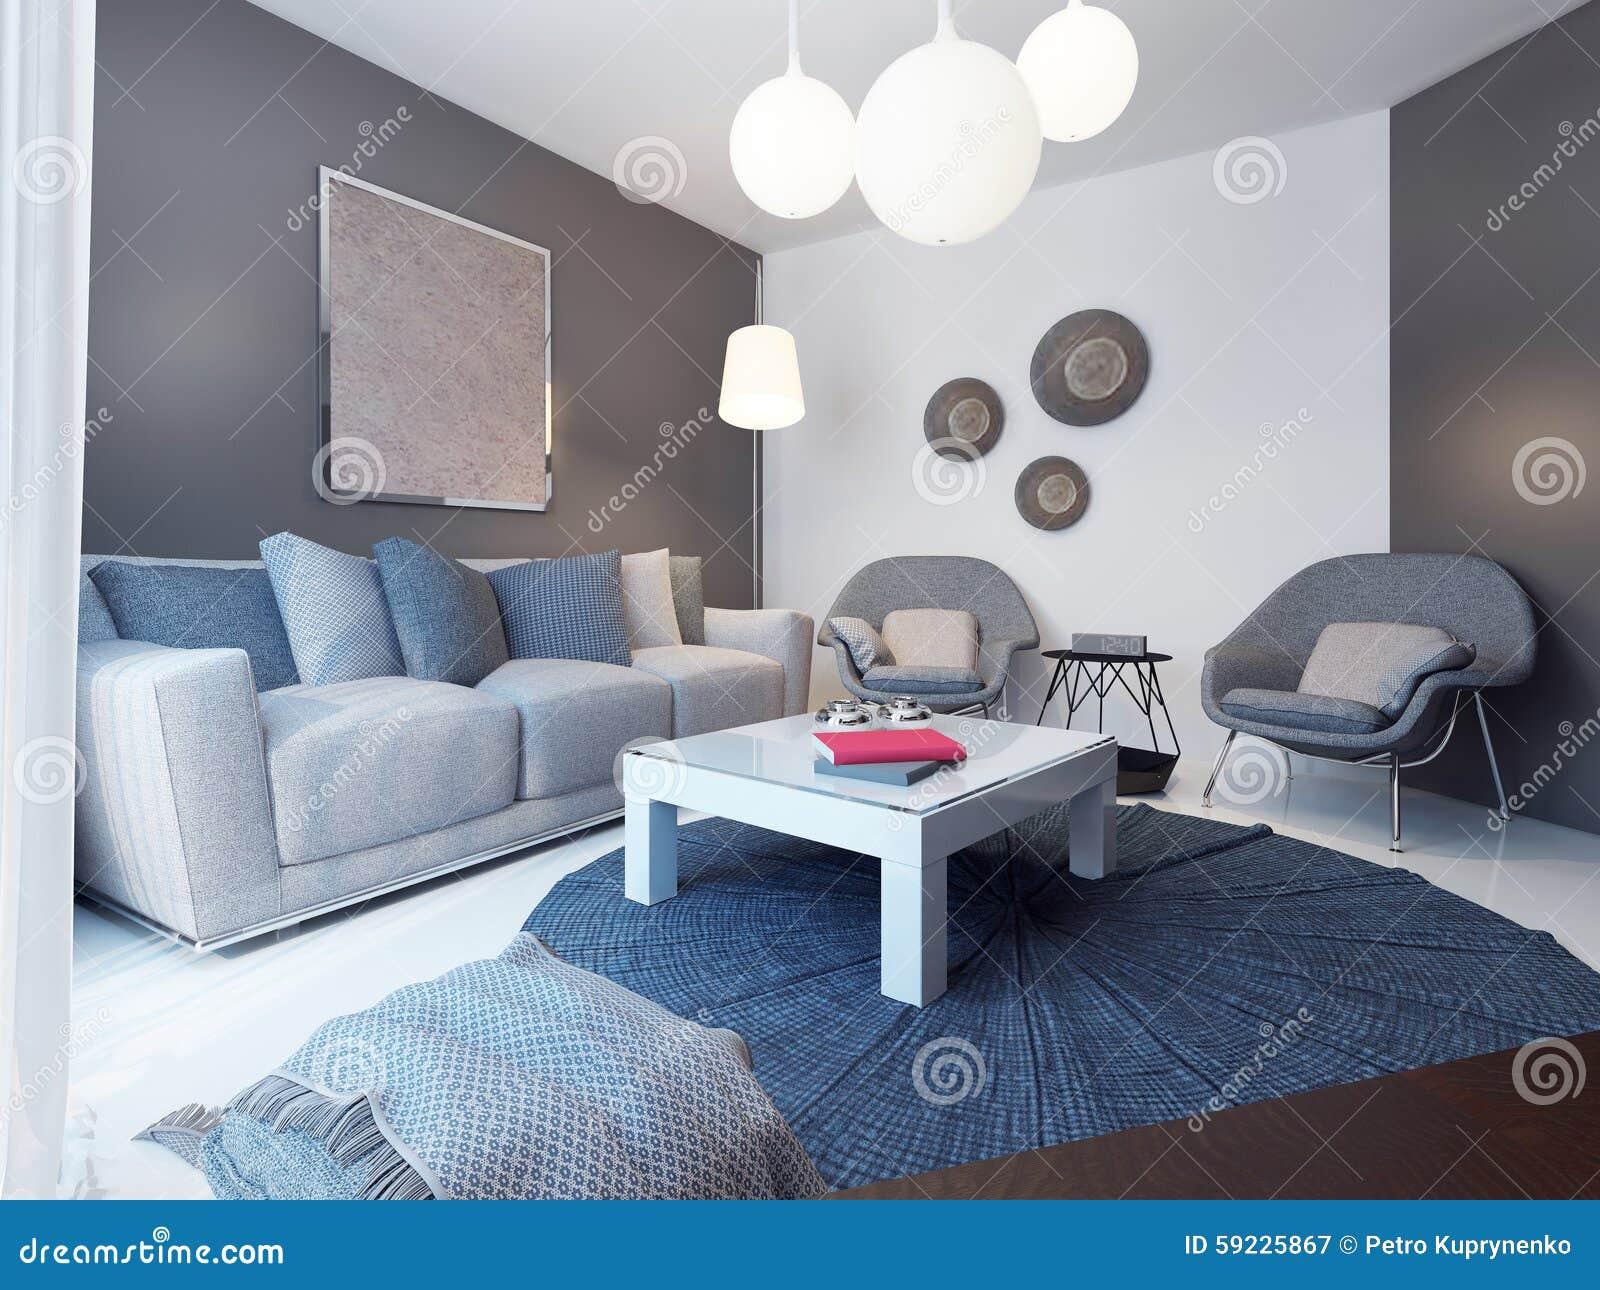 Cozy Lounge Room Minimalist Style Stock Illustration